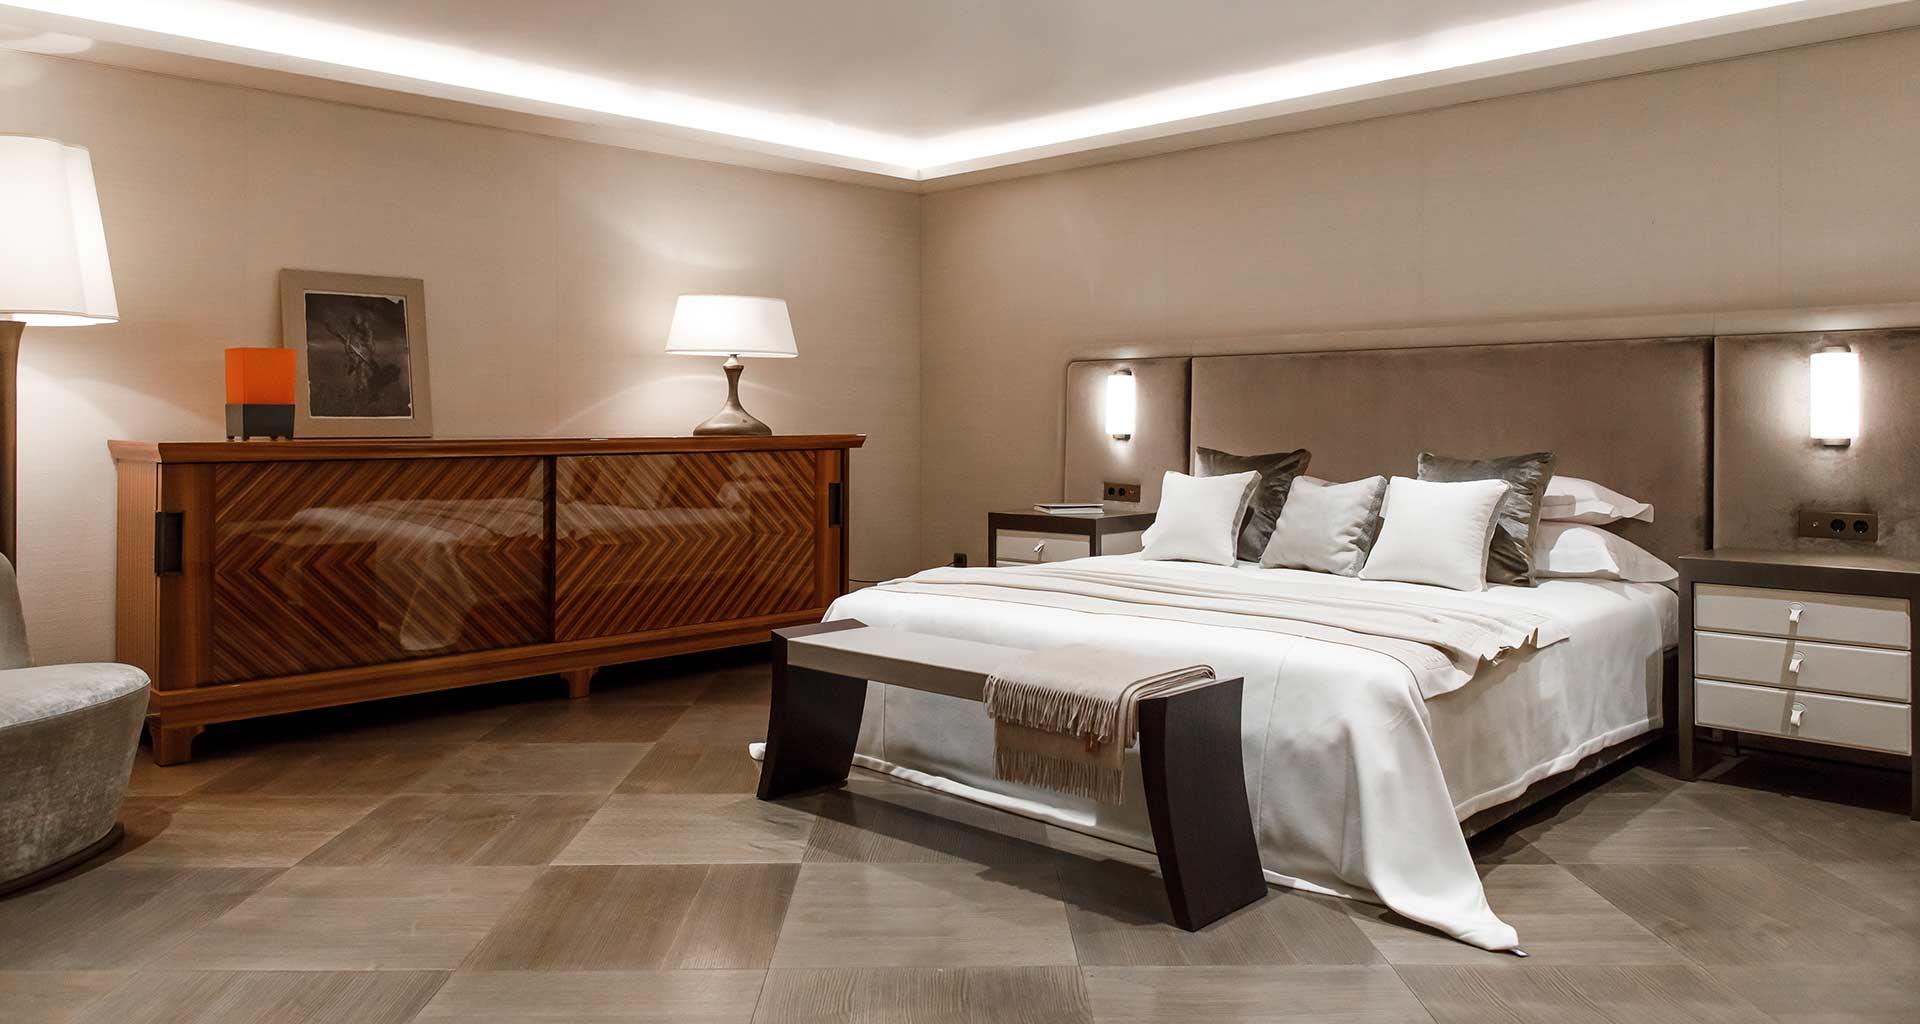 Bedroom in Promemoria's single-brand showroom in Moscow | Promemoria